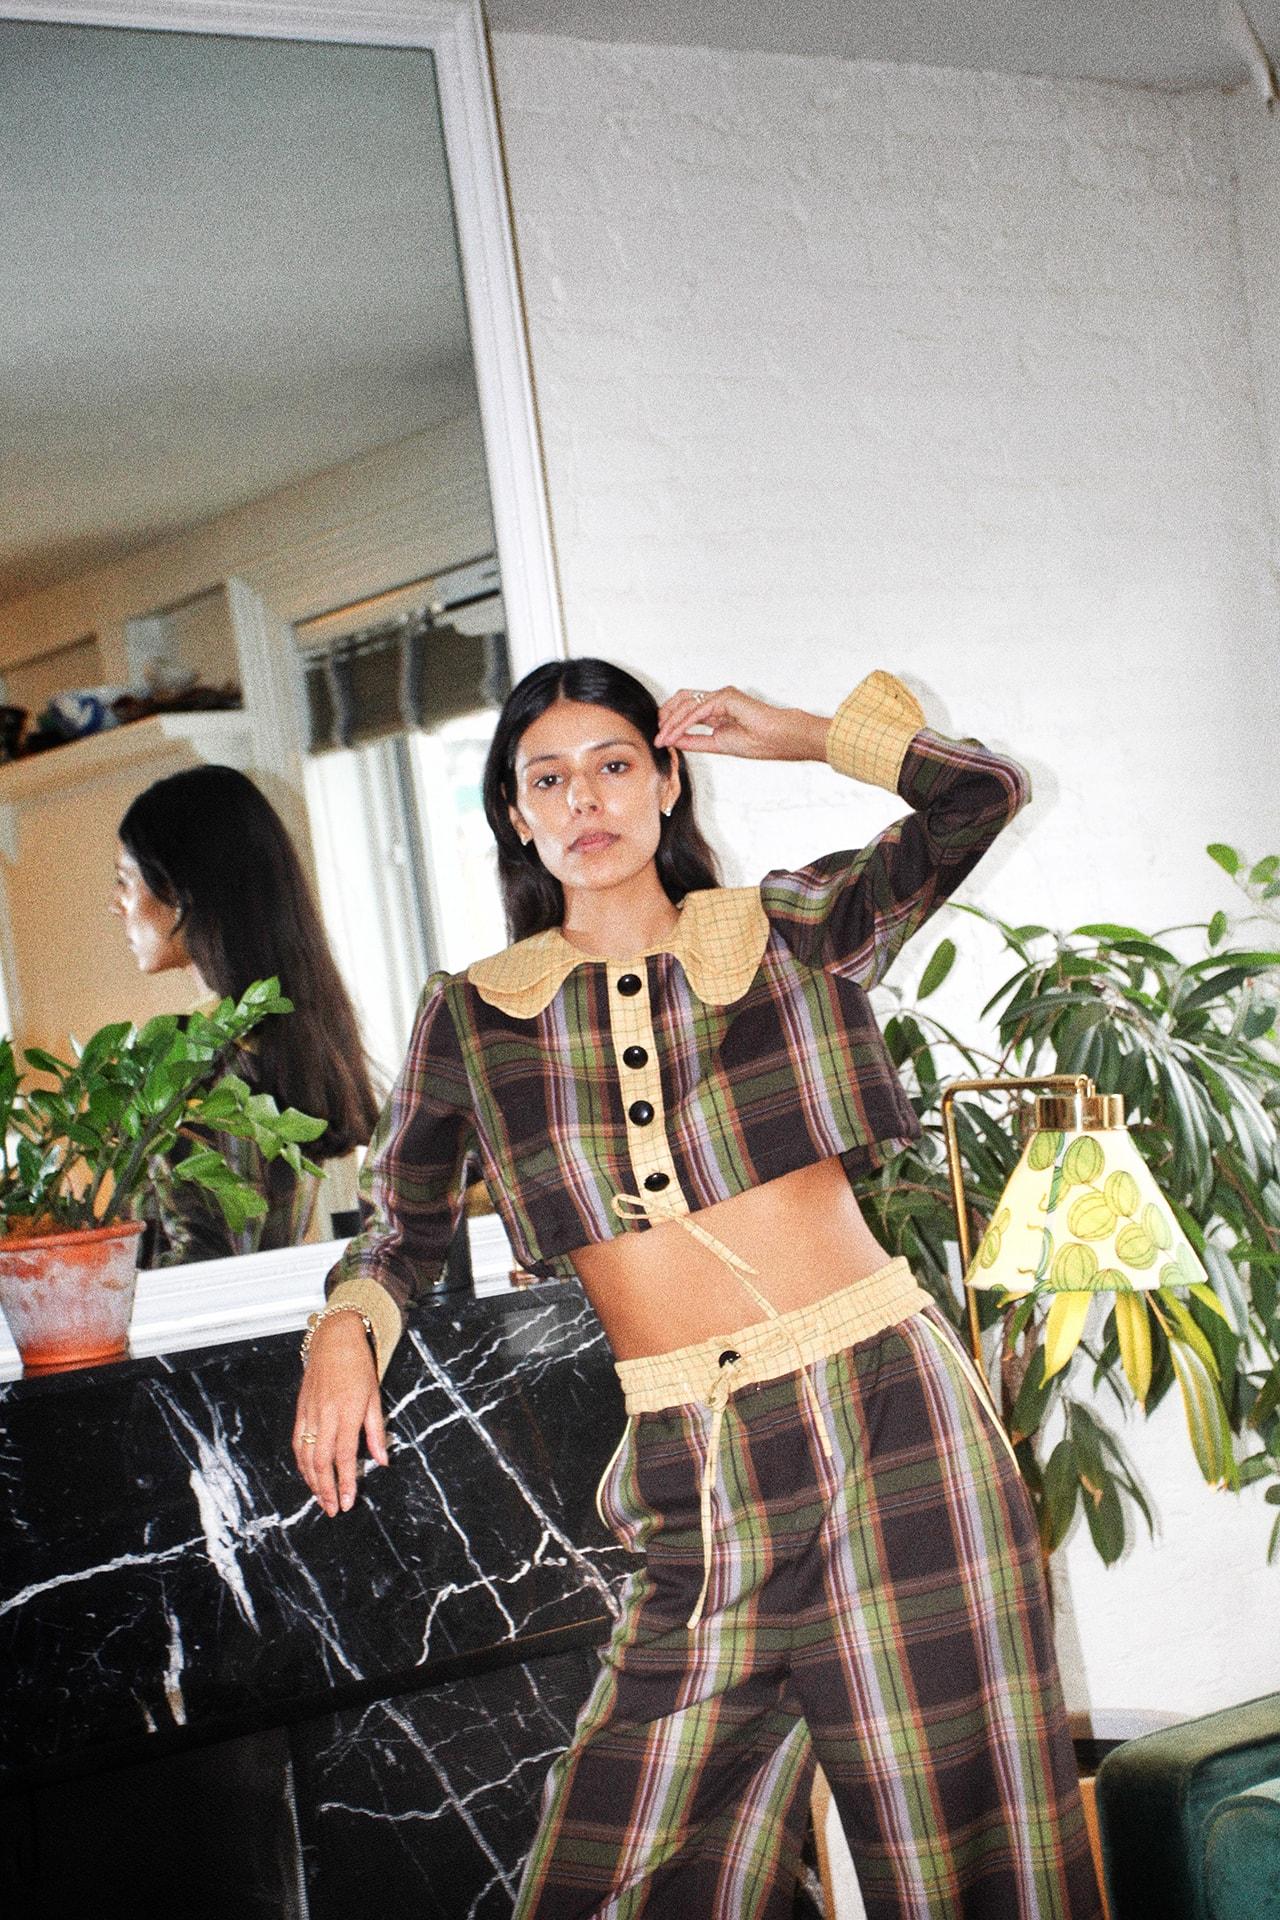 Babba C Rivera Ceremonia Clean Haircare Brand Founder Beauty Swedish Latina New York City Influencer